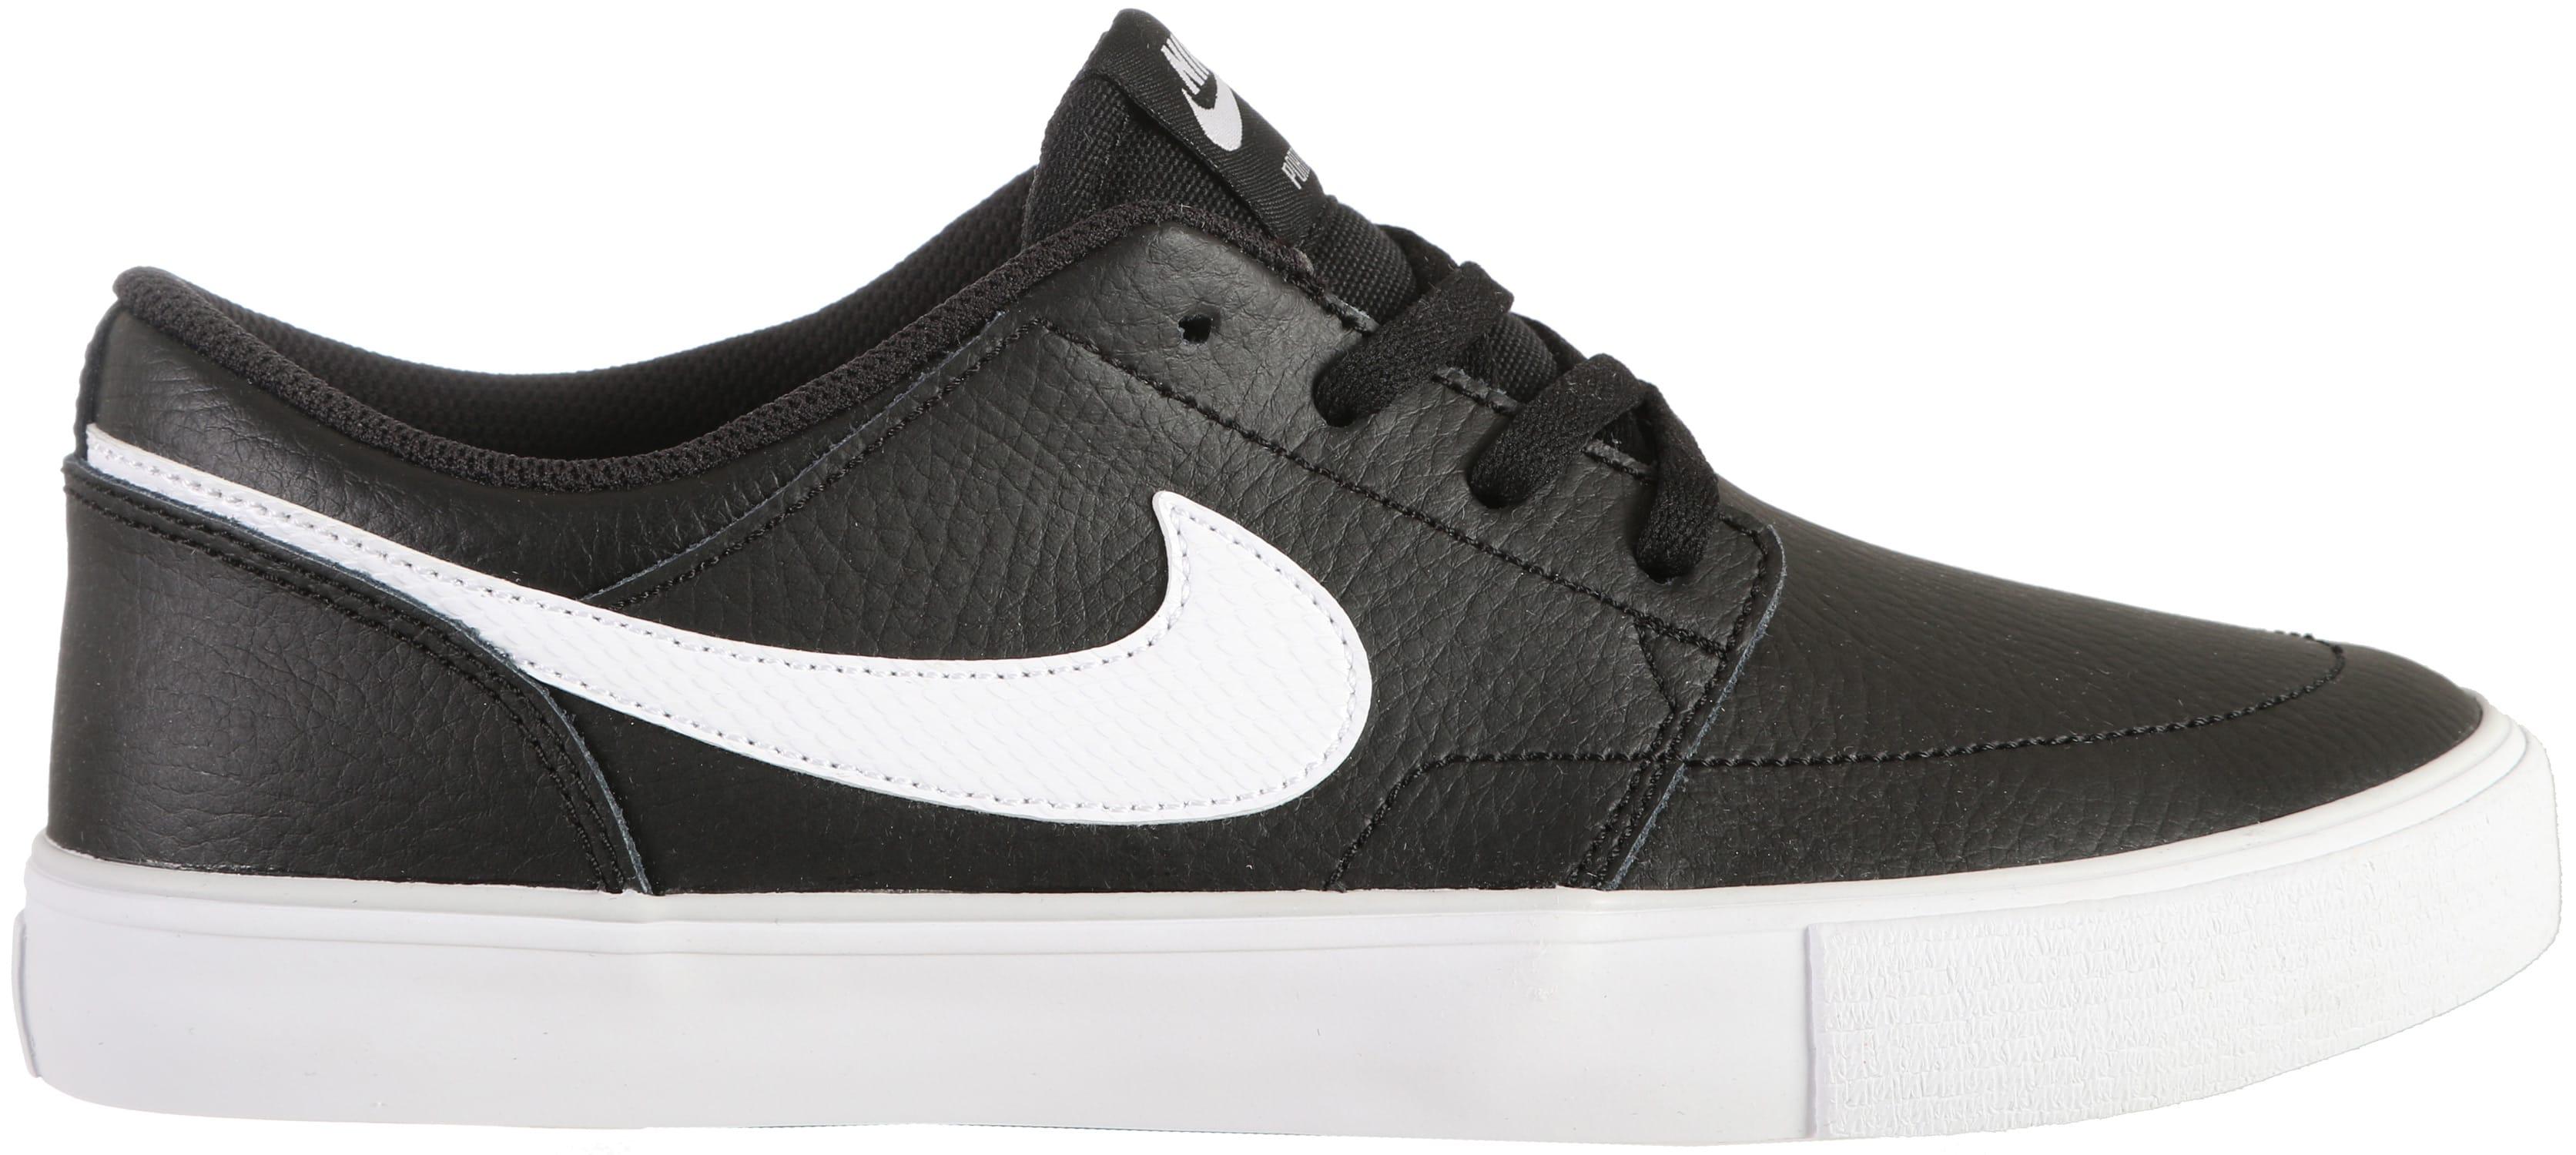 bb585b410434 Nike SB Portmore II Solarsoft Premium Skate Shoes - thumbnail 1